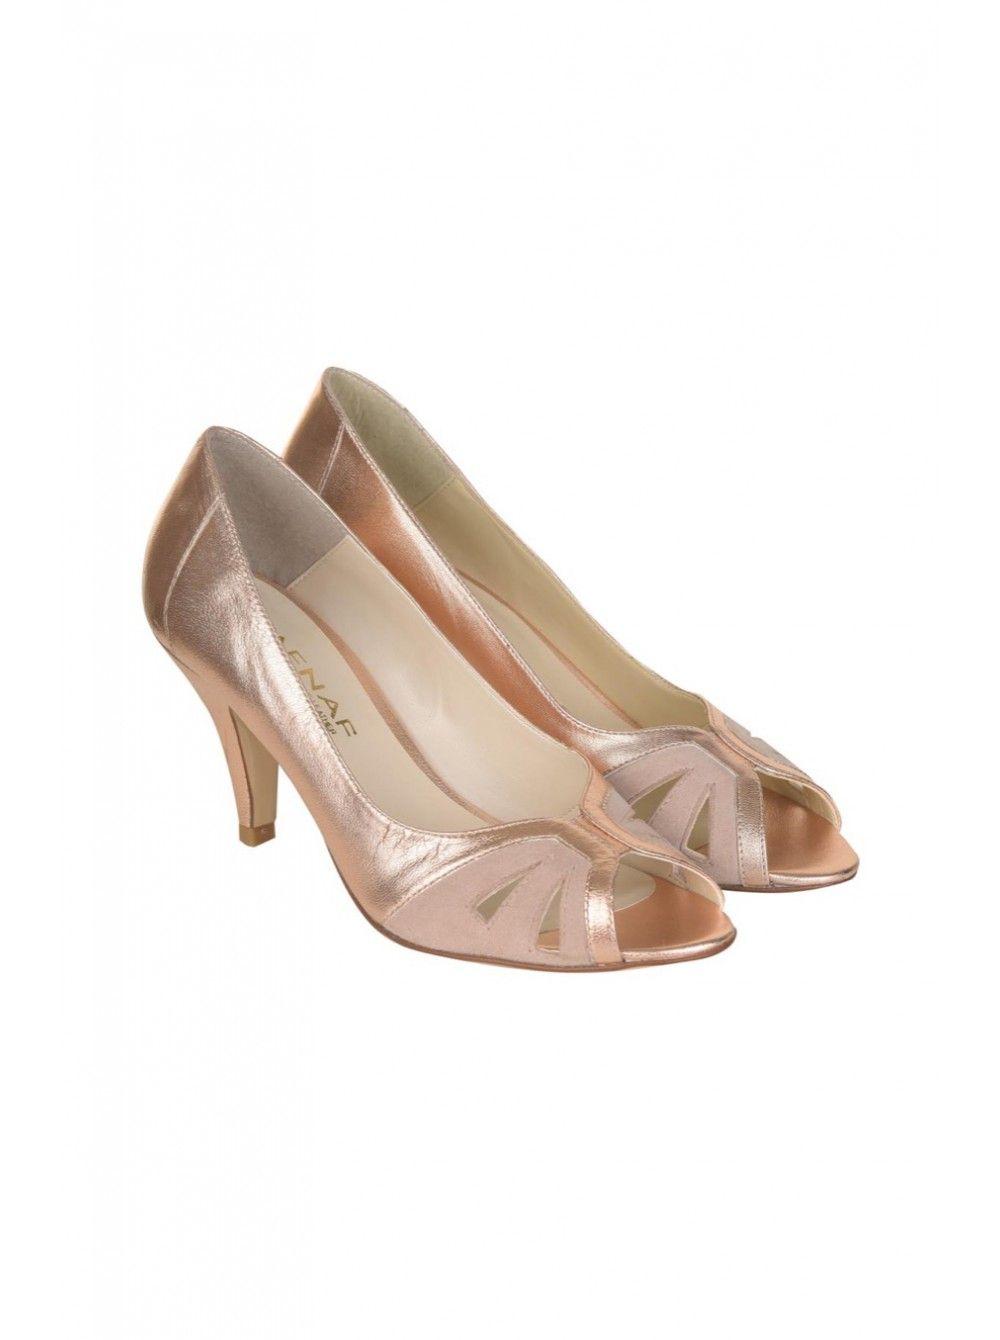 Sandales Femmes Poudre Rose Madeleine / Rose zWkfT